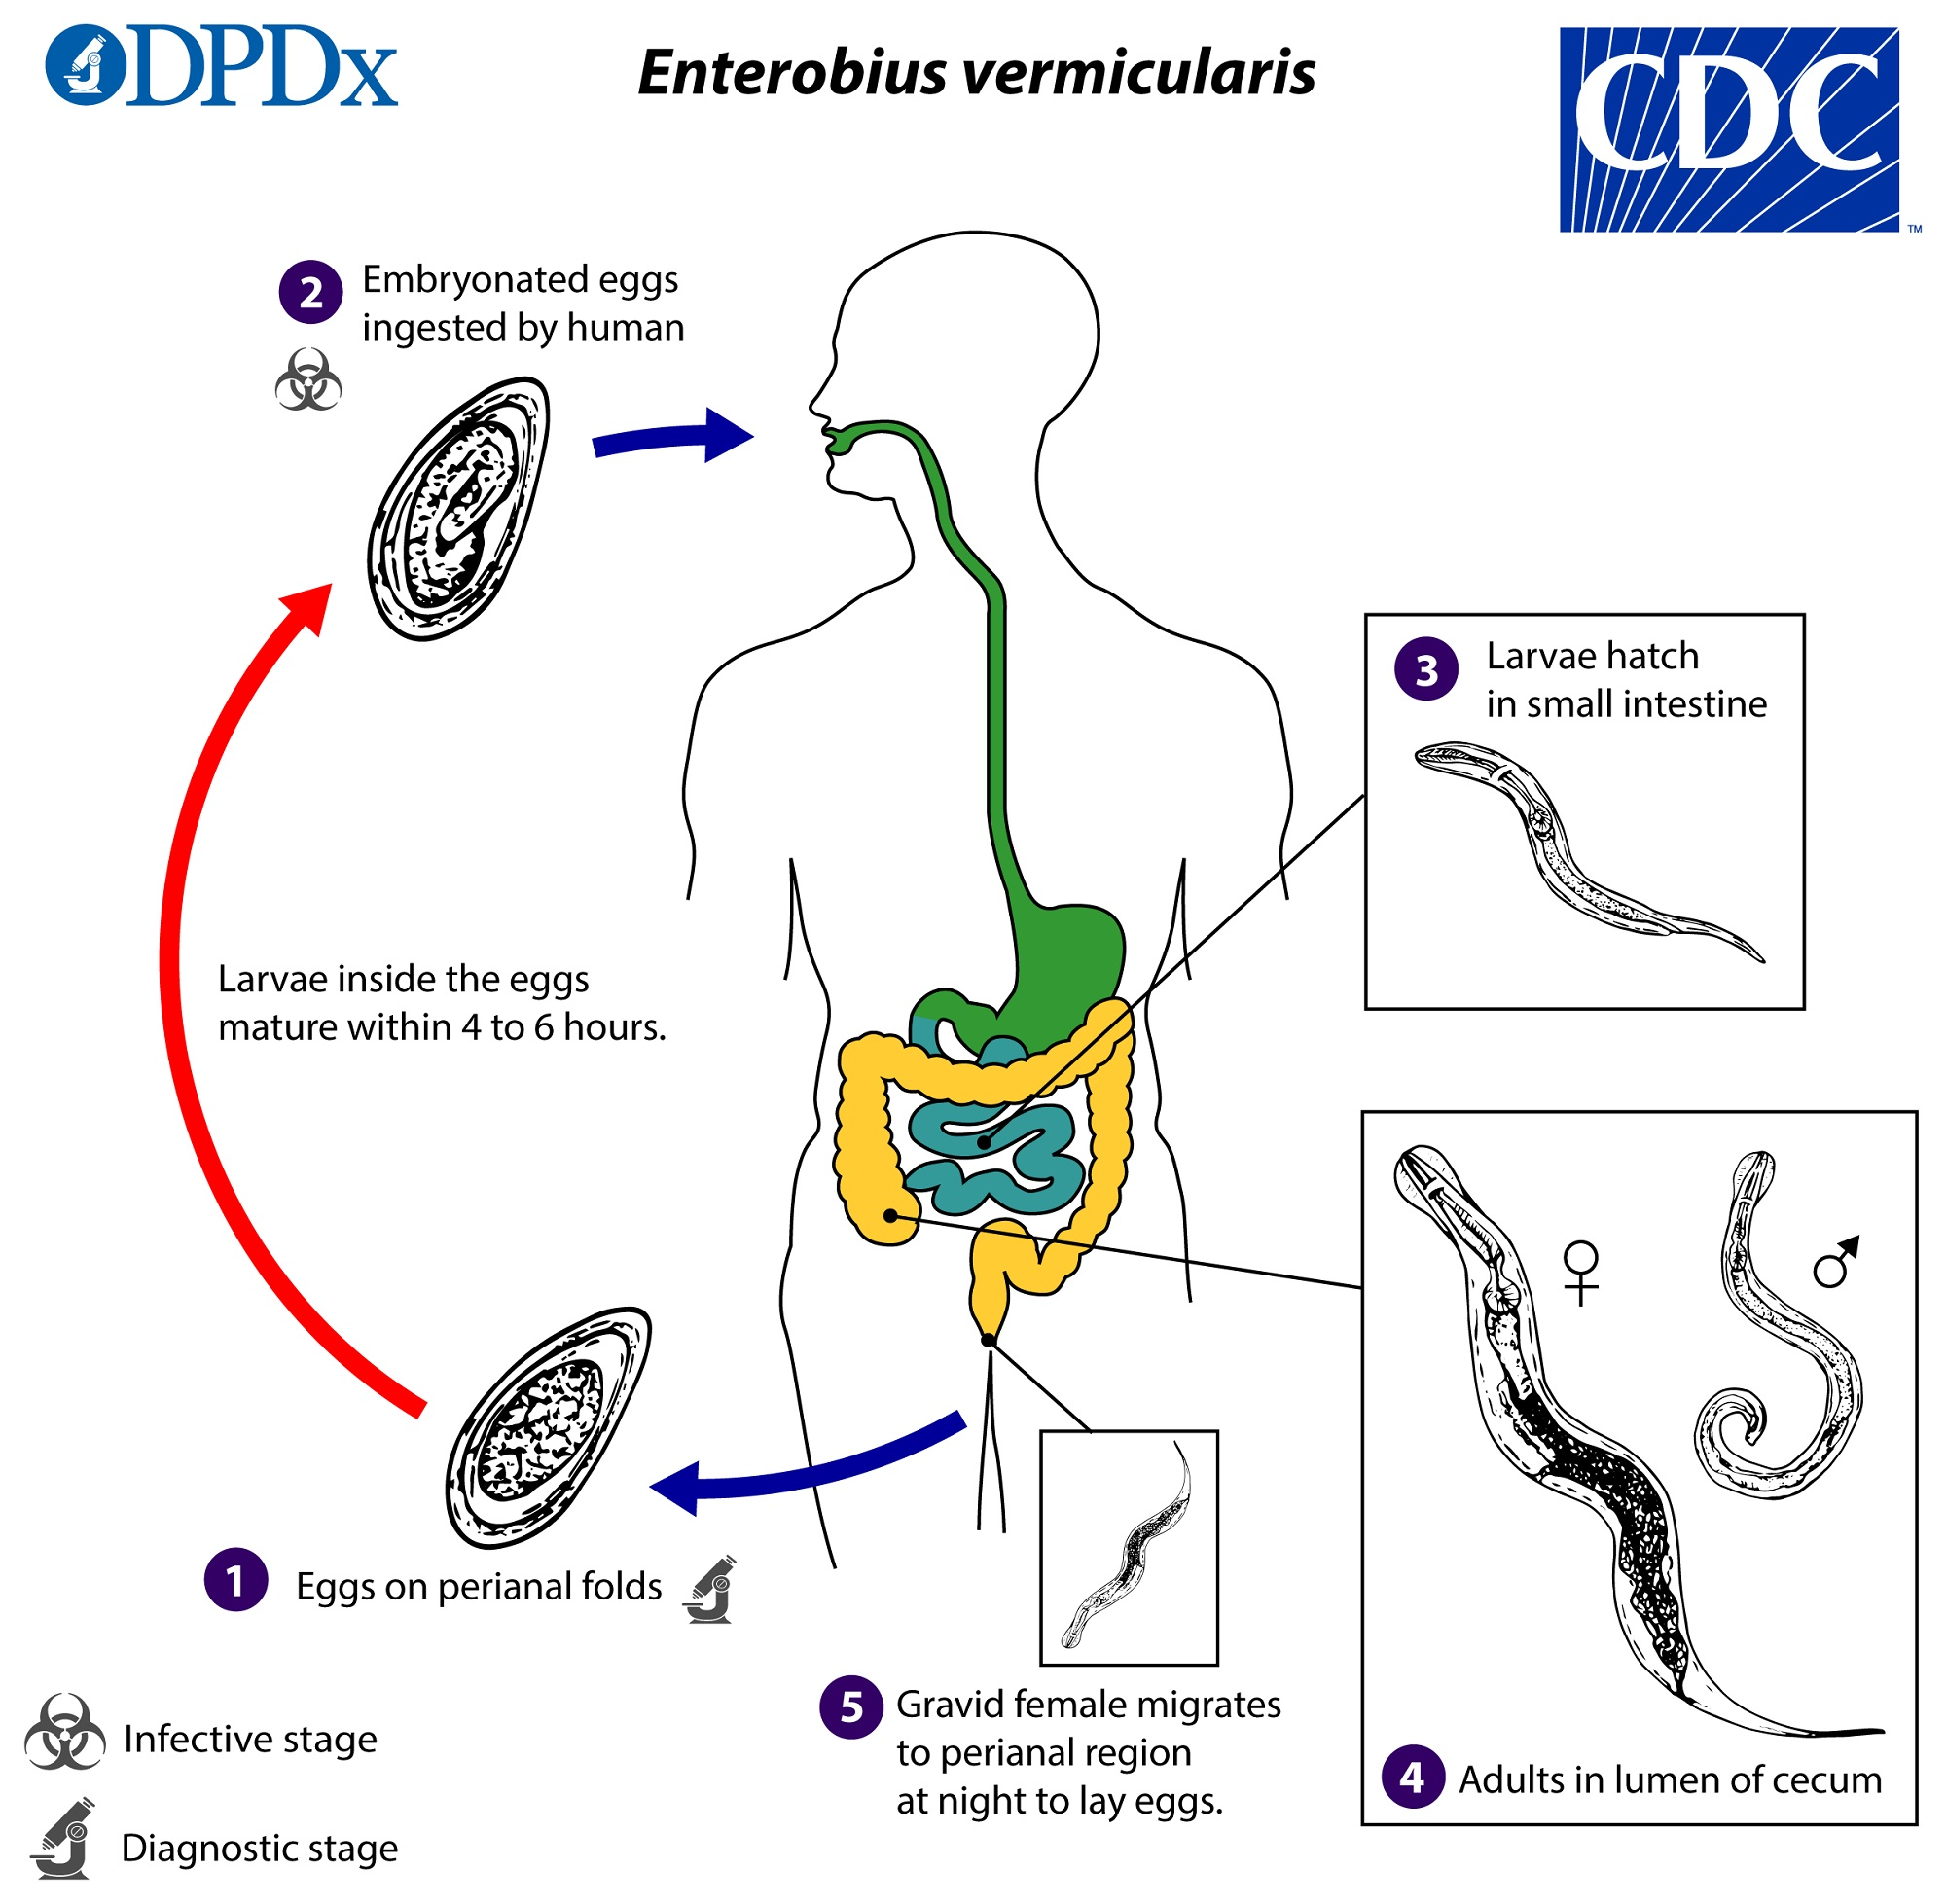 enterobius vermicularis genus medicamente pentru corespondența de vierme